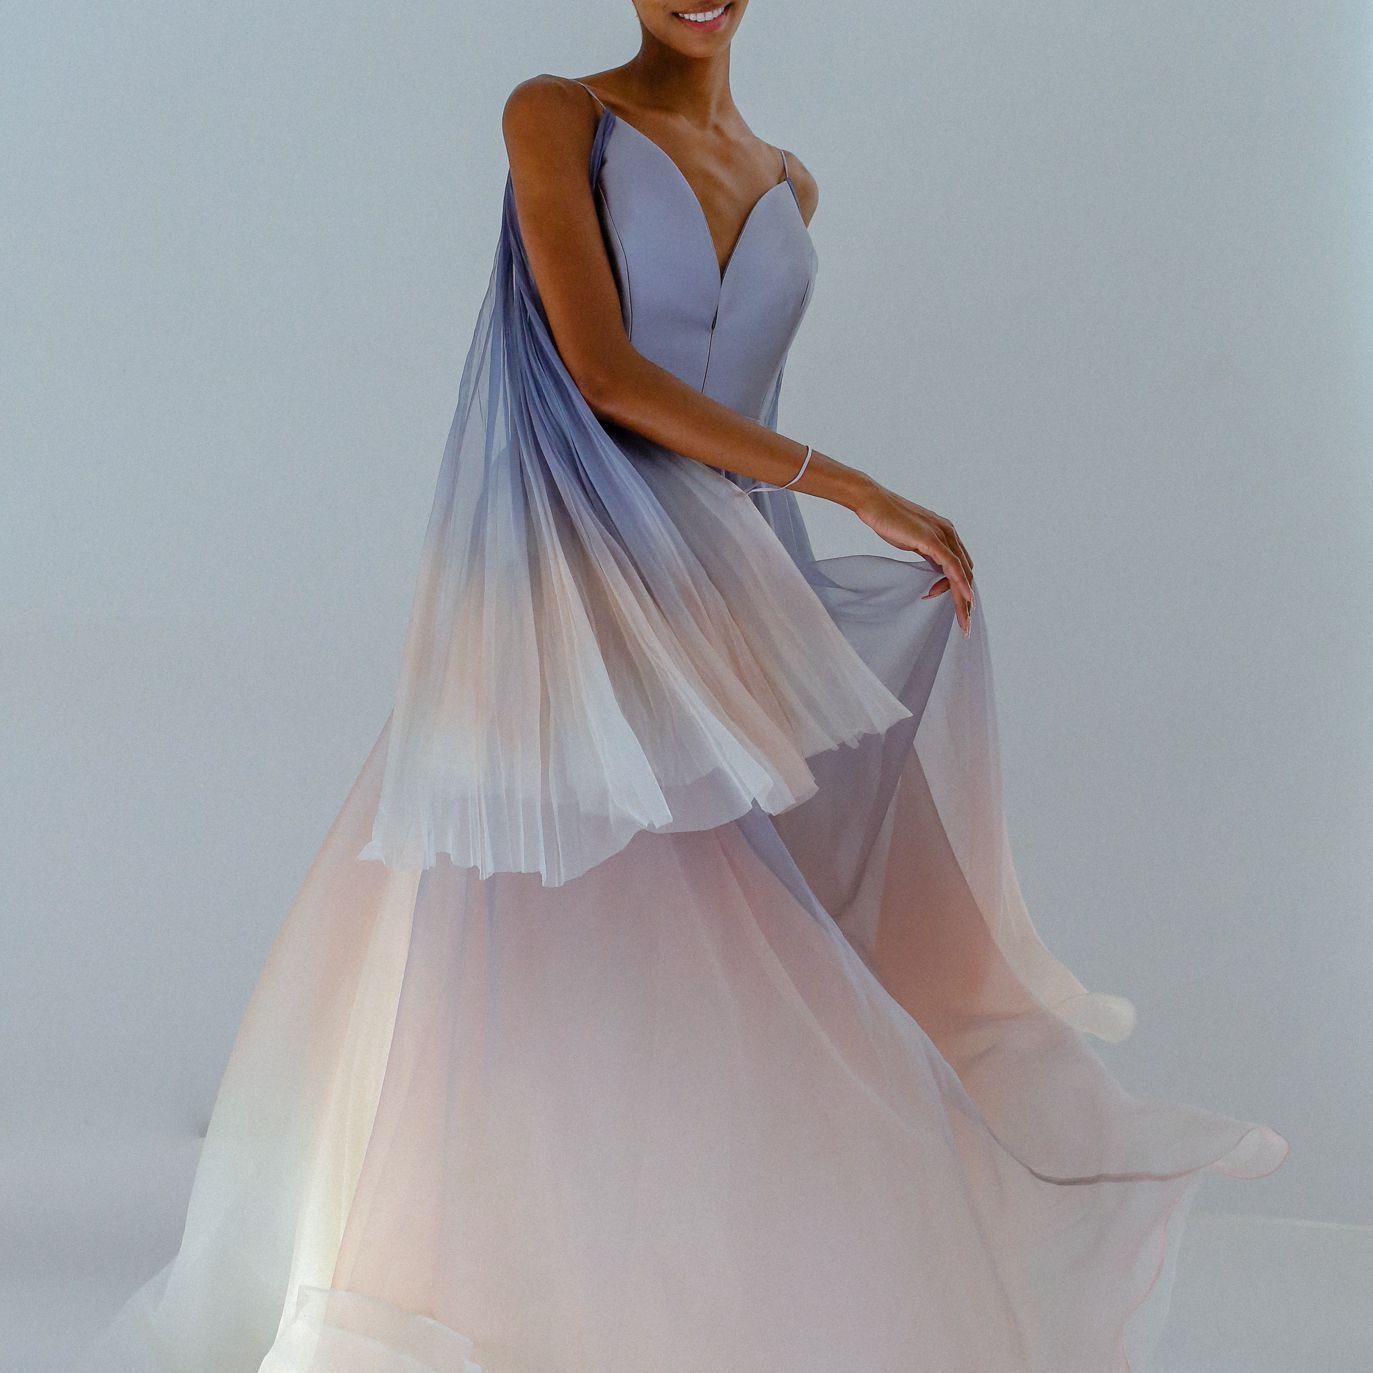 wedding dress by leanne marshall